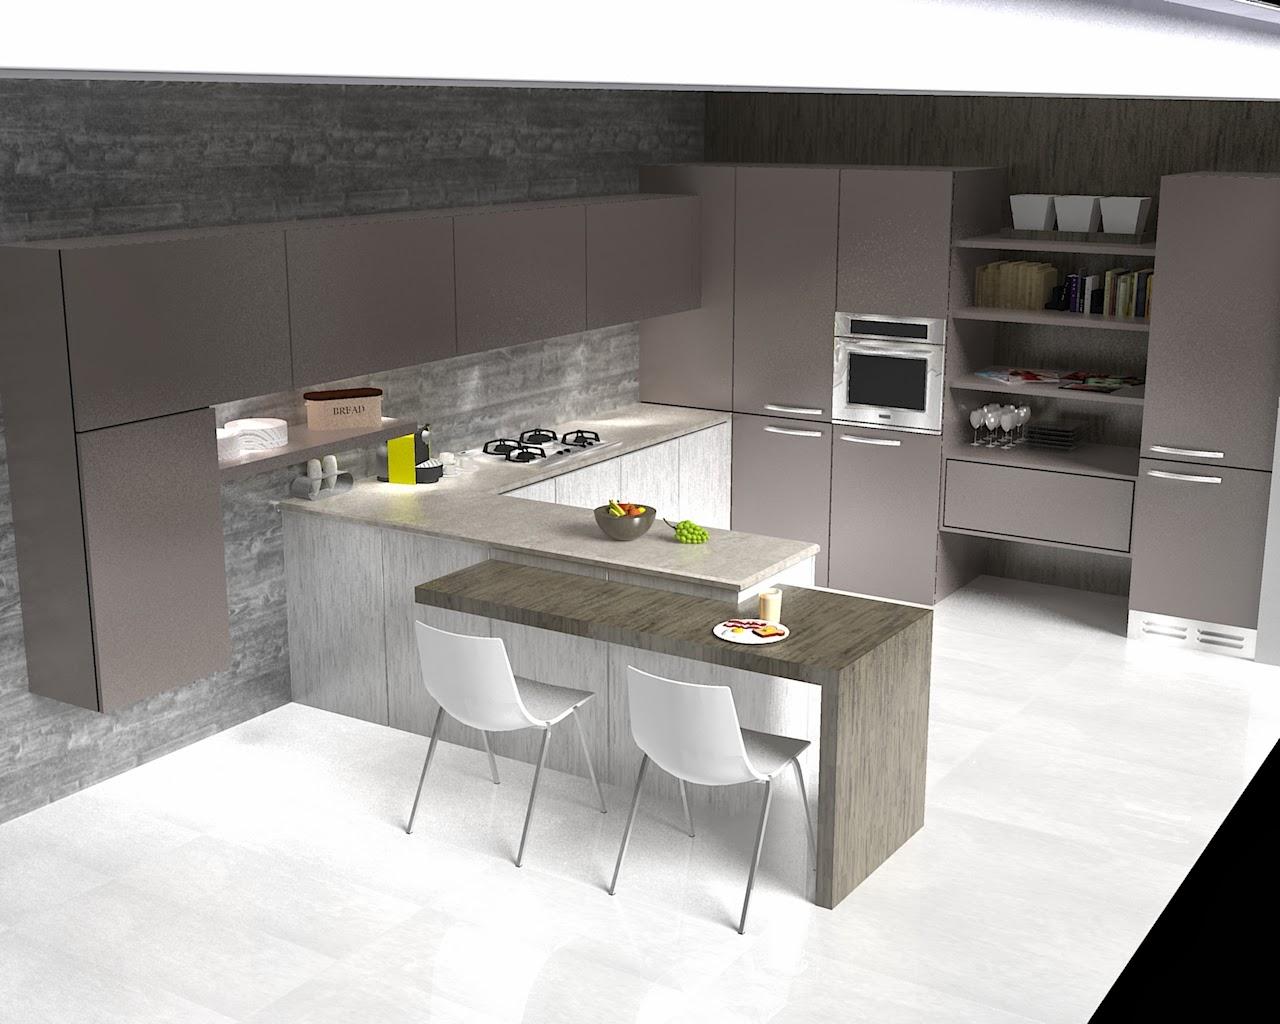 Simo galleria dei vostri lavori cucina for Disegnare cucina 3d online